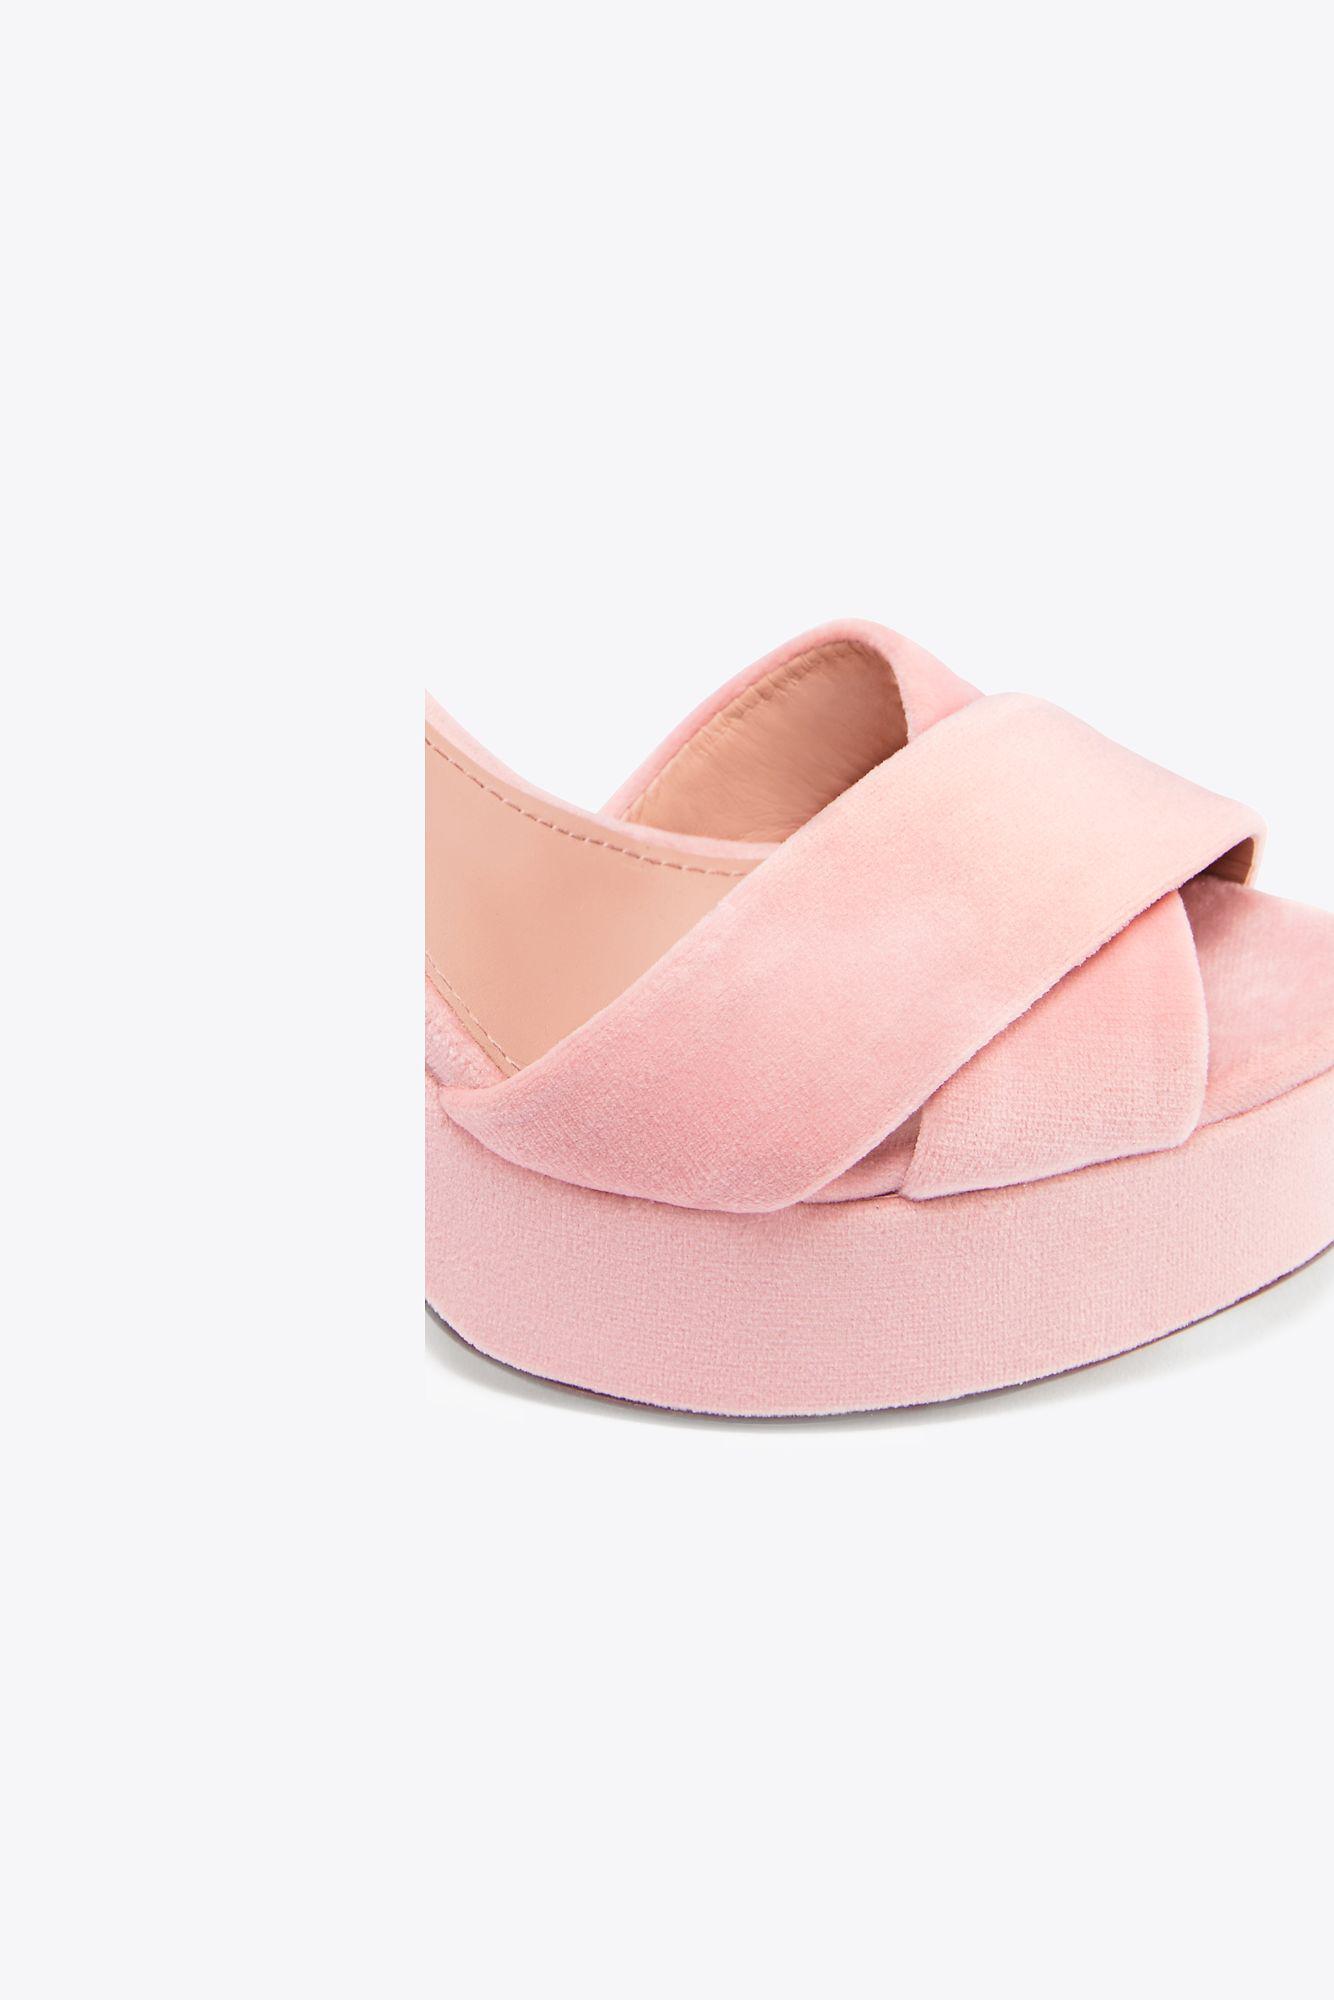 e61efc29590ffc Lyst - Tory Burch Loretta Velvet Platform Sandal in Pink